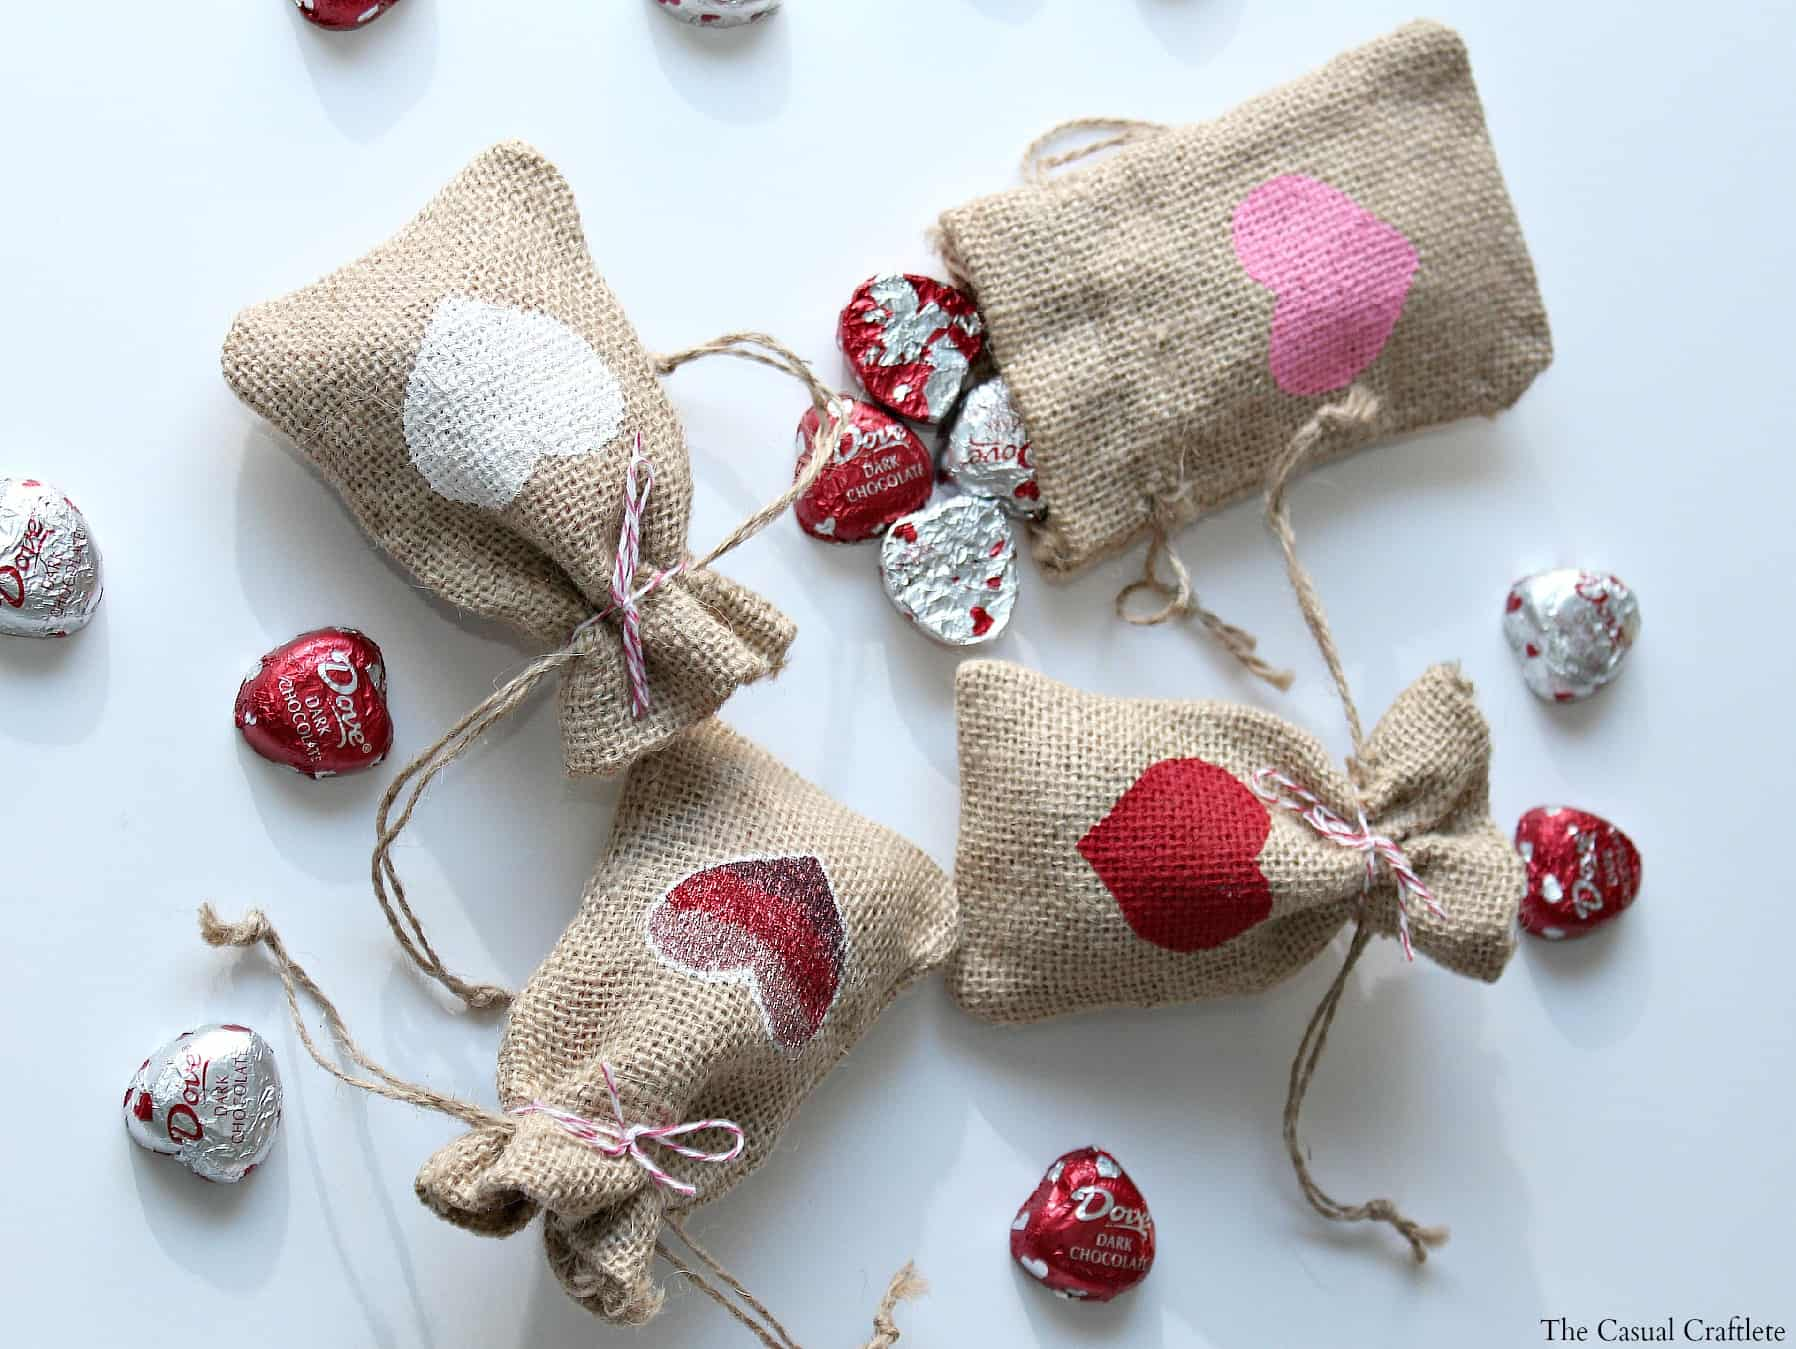 diy valentines day burlap gift bags